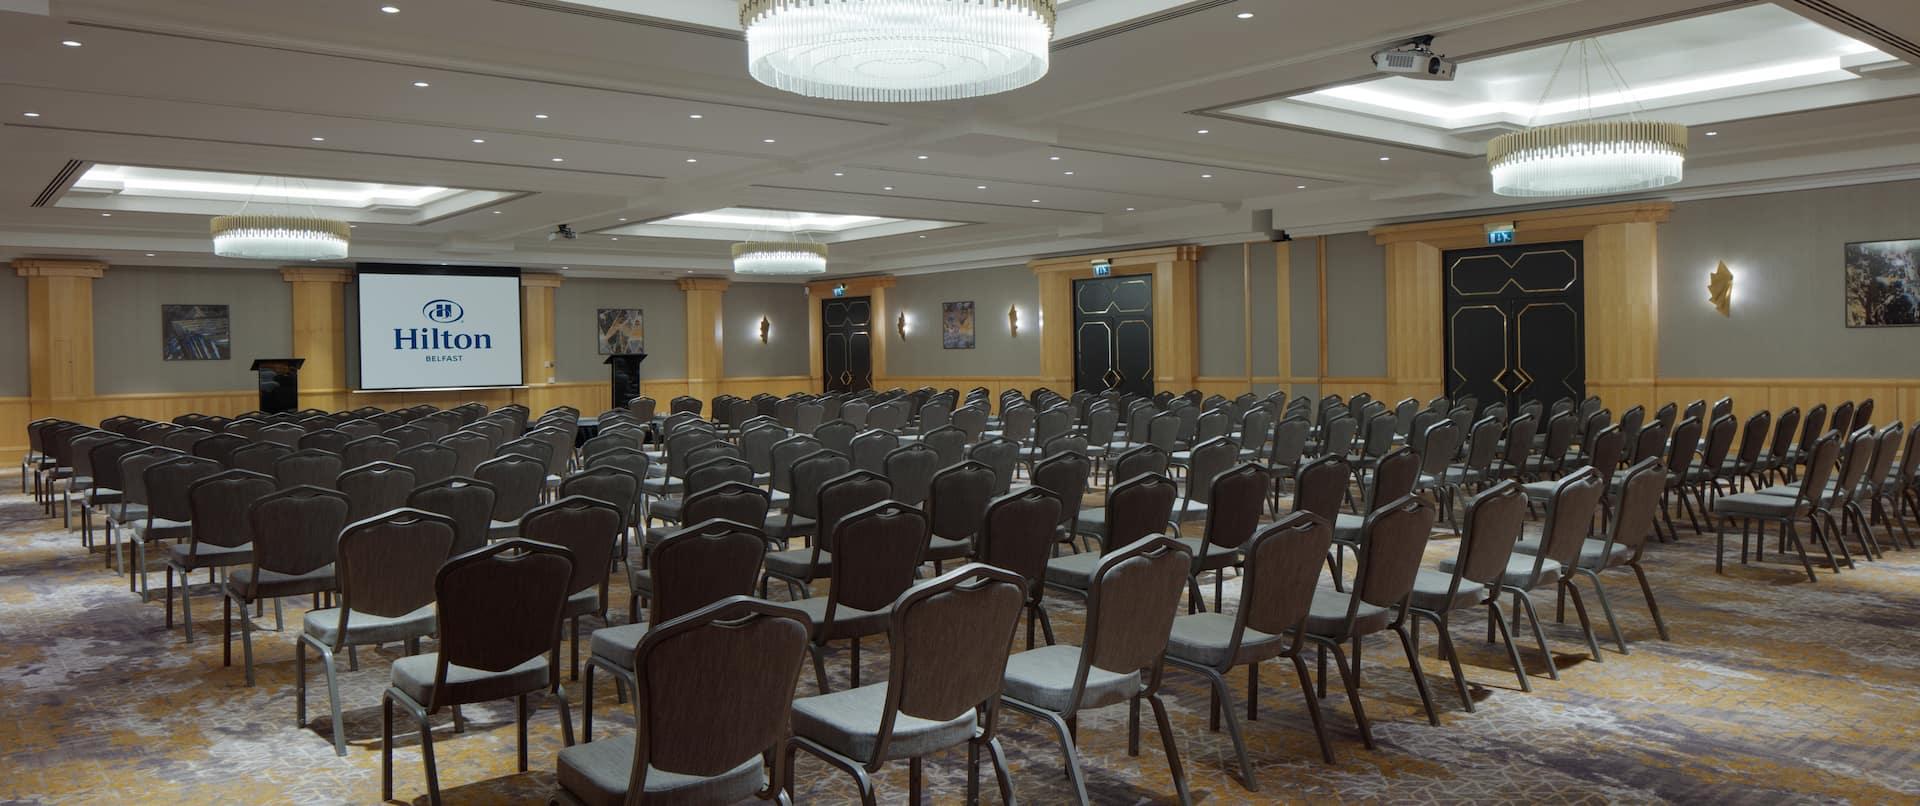 Meeting Room Chairs Setup